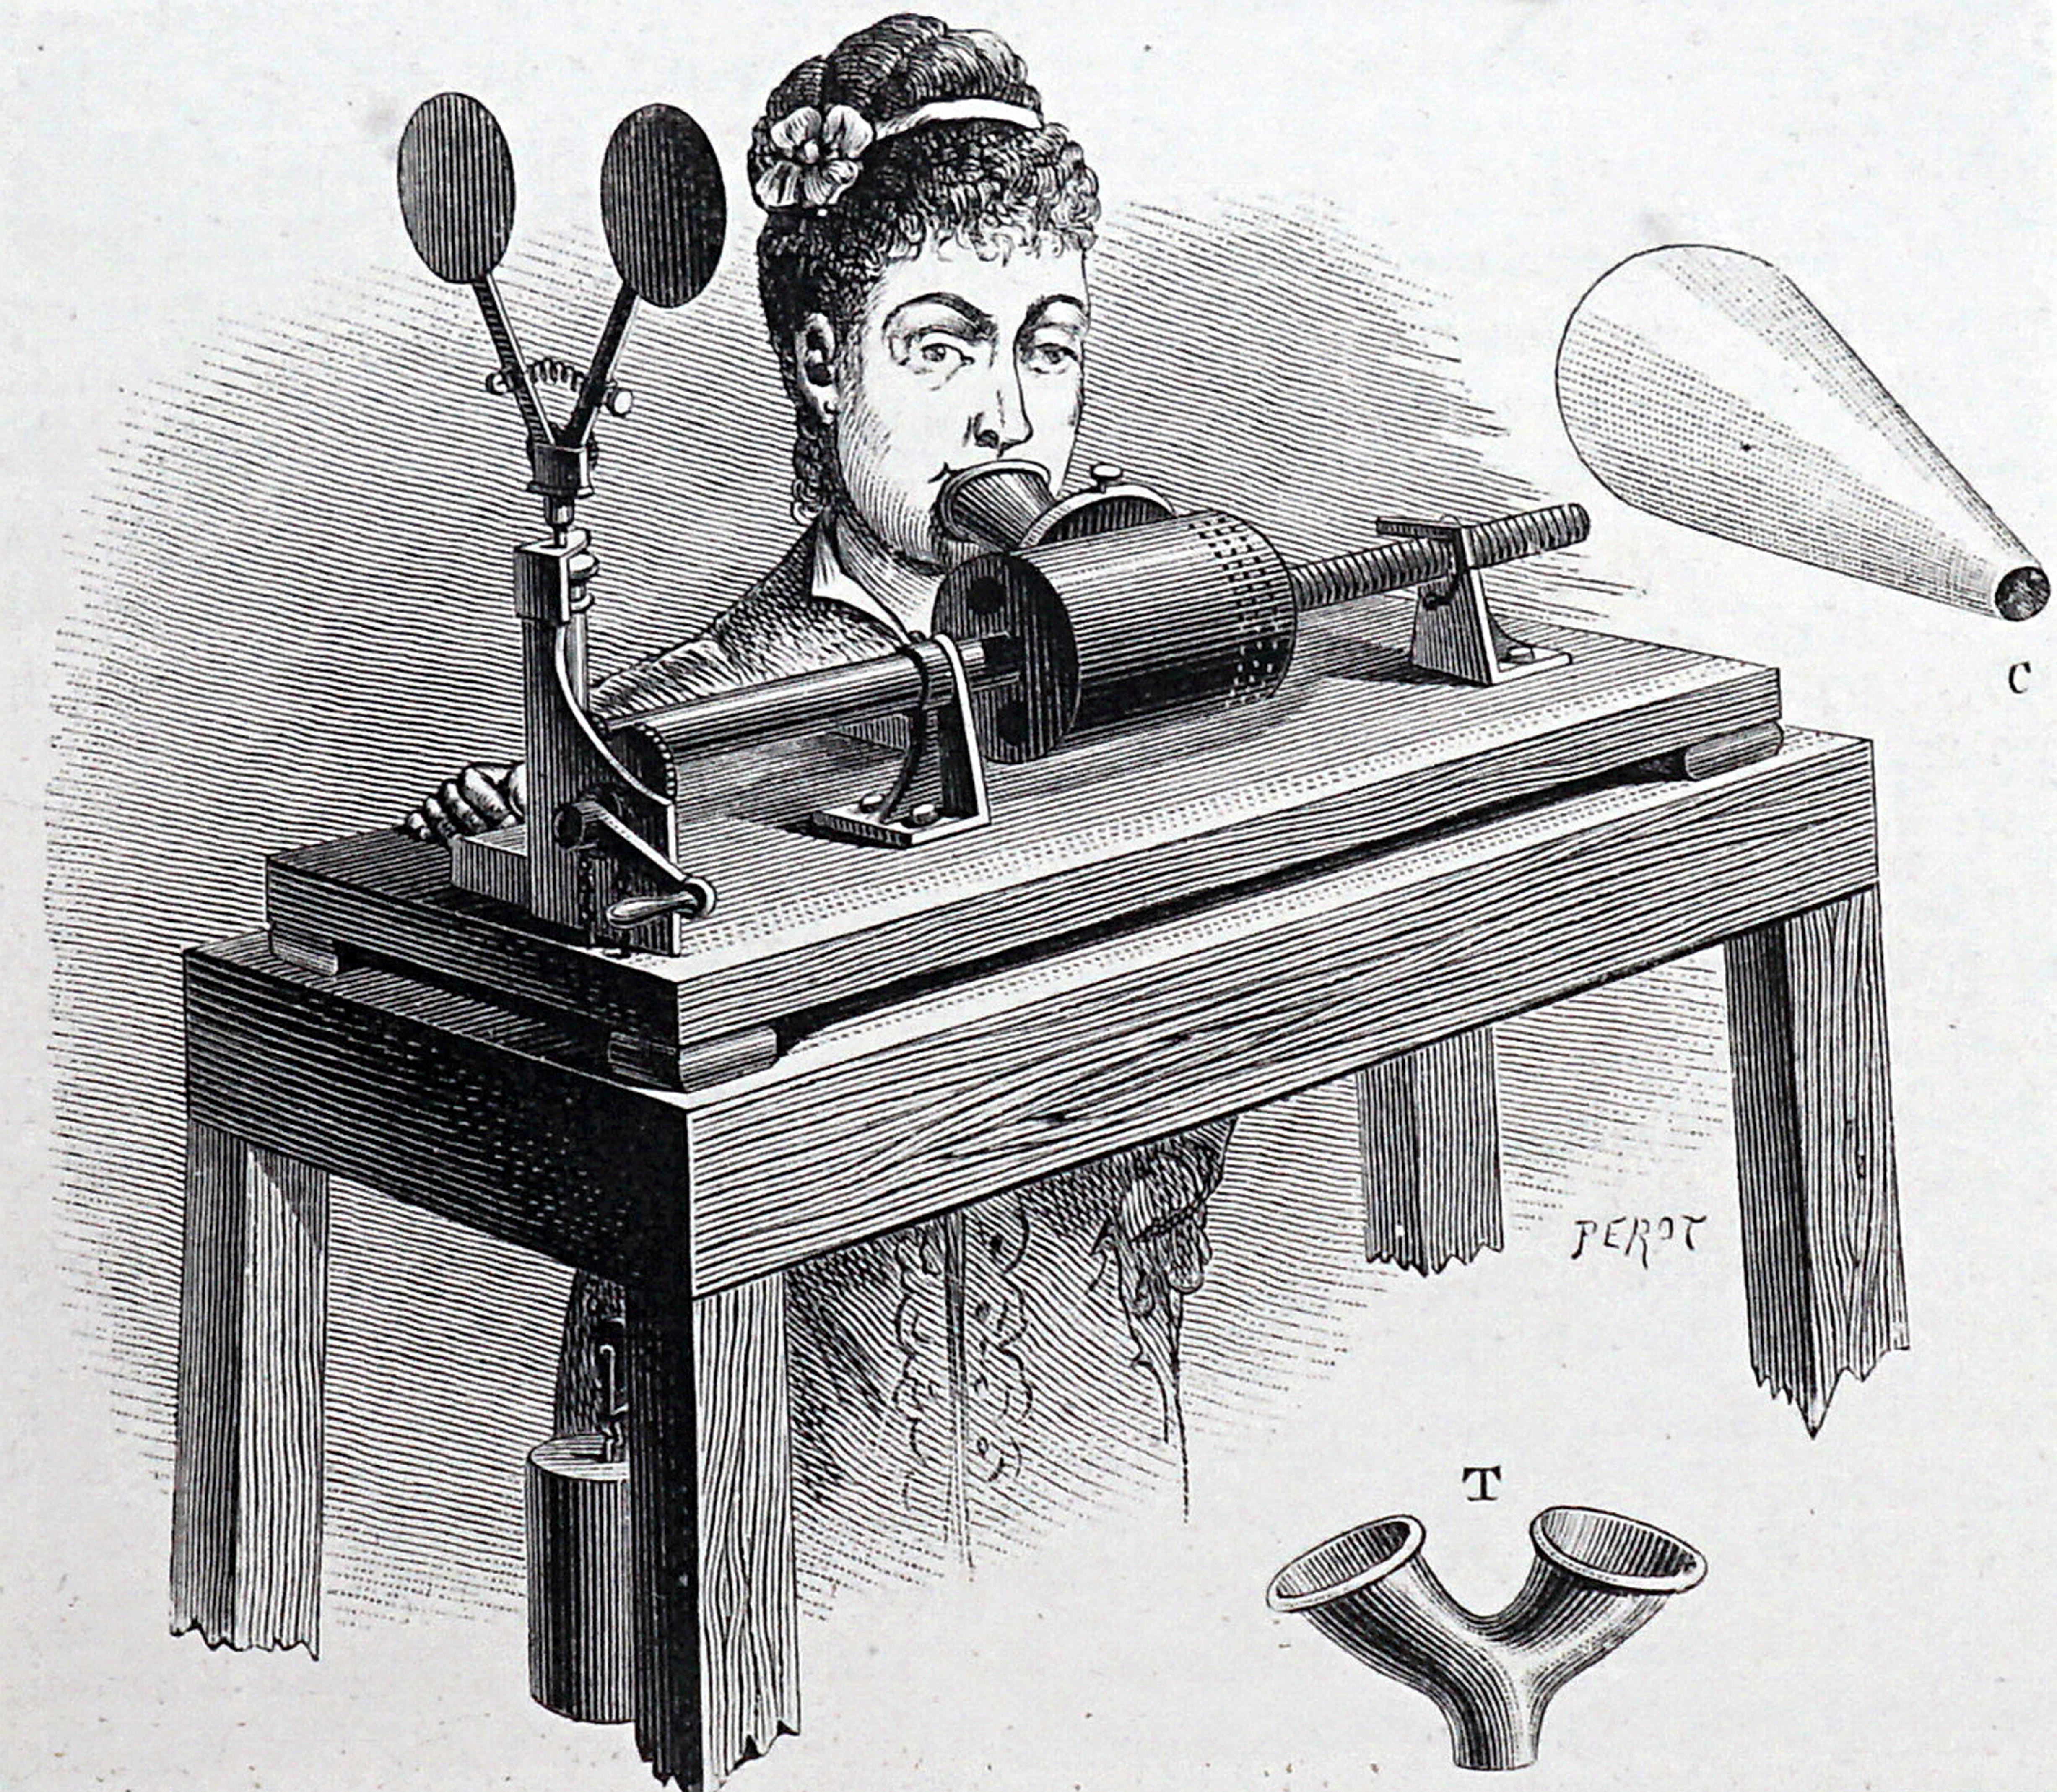 Making a recording on Edison Clockwork Phonograph.